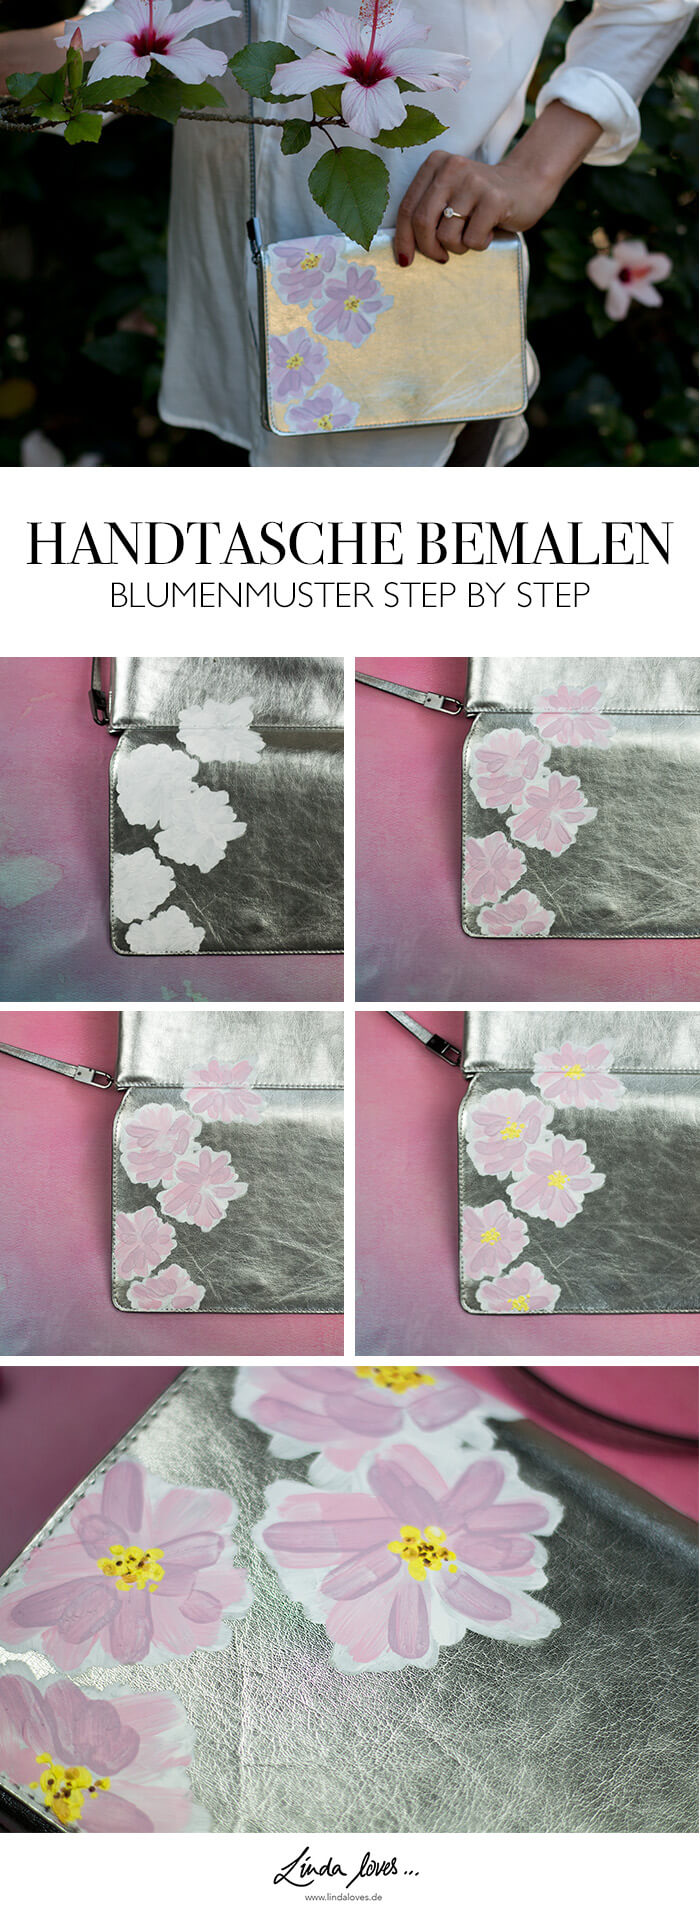 DIY Handtasche bemalen mit Acylfarben Upcycling Blumenmuster Step by Step Anleitung DIY Blog lindaloves.de